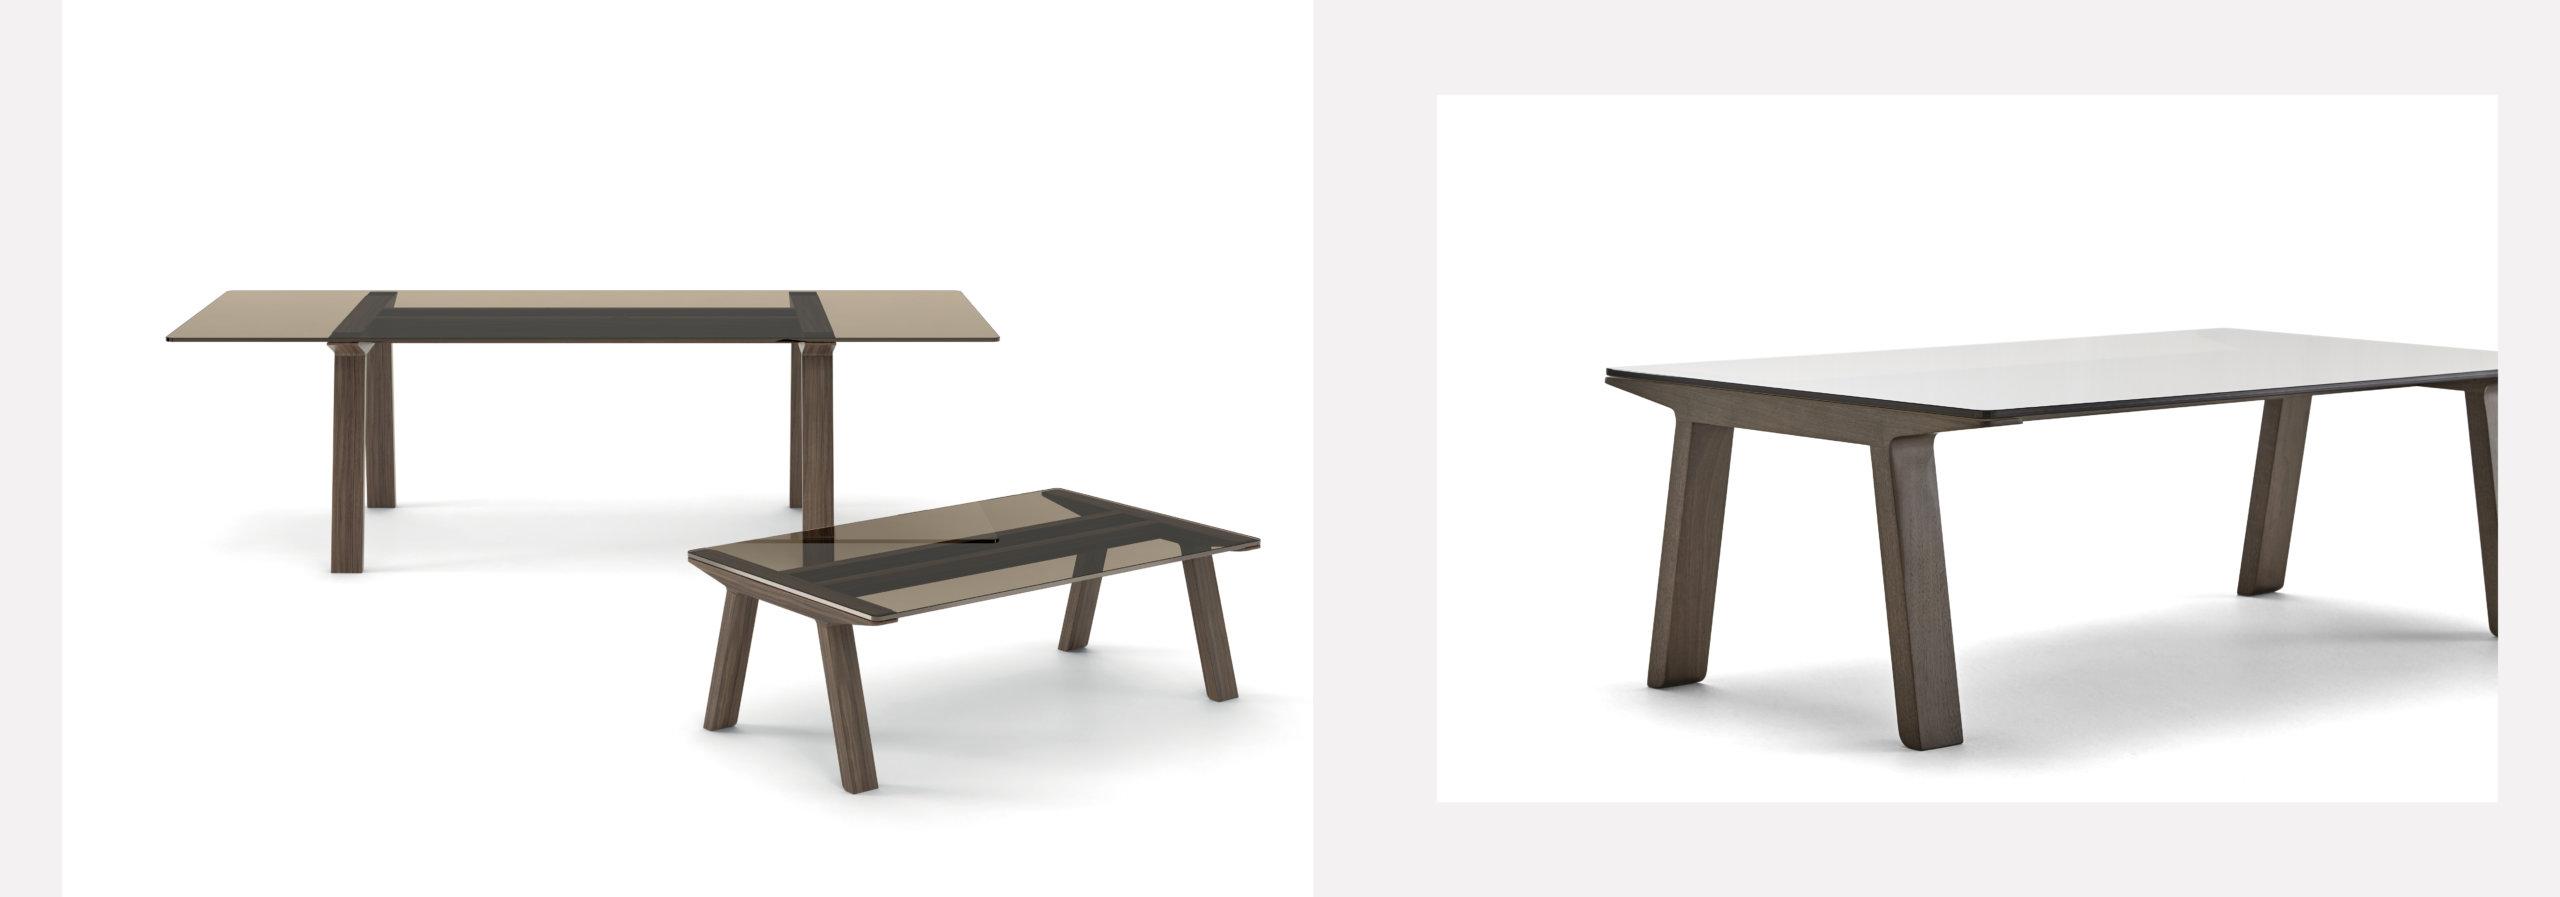 MITIS_COFFE_TABLE_SLIDE_5